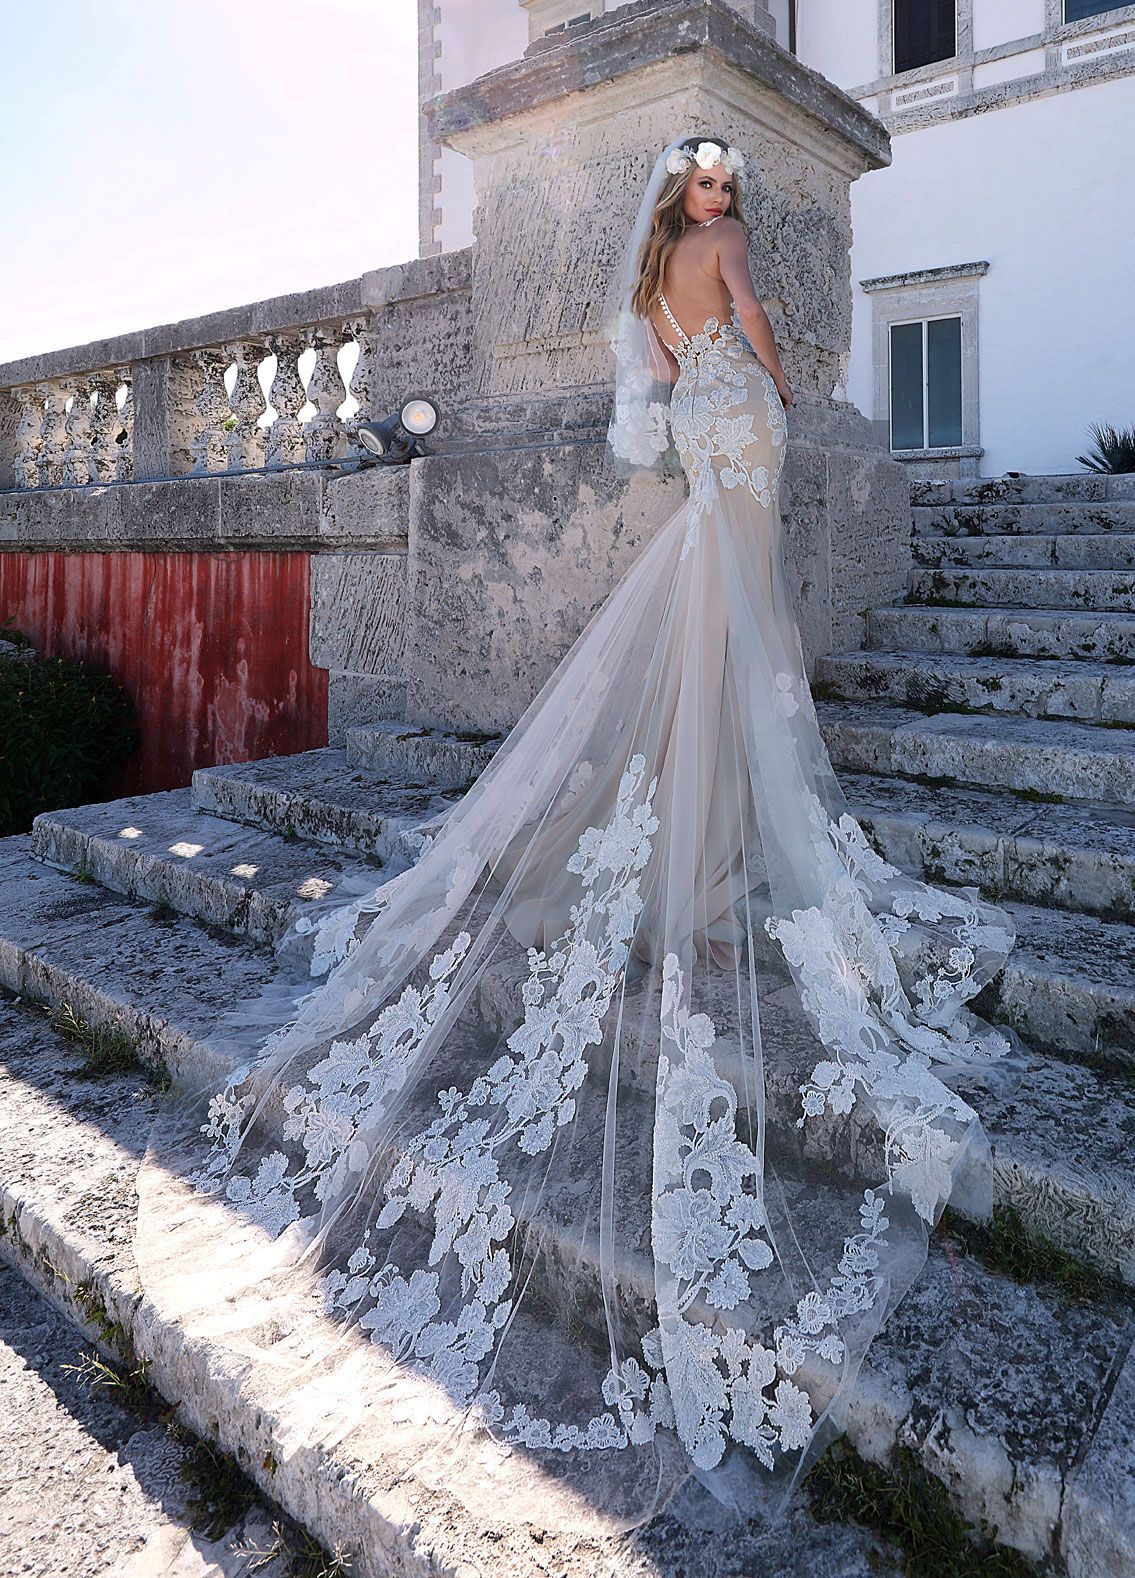 Style ashley u justin bride coming in wedding